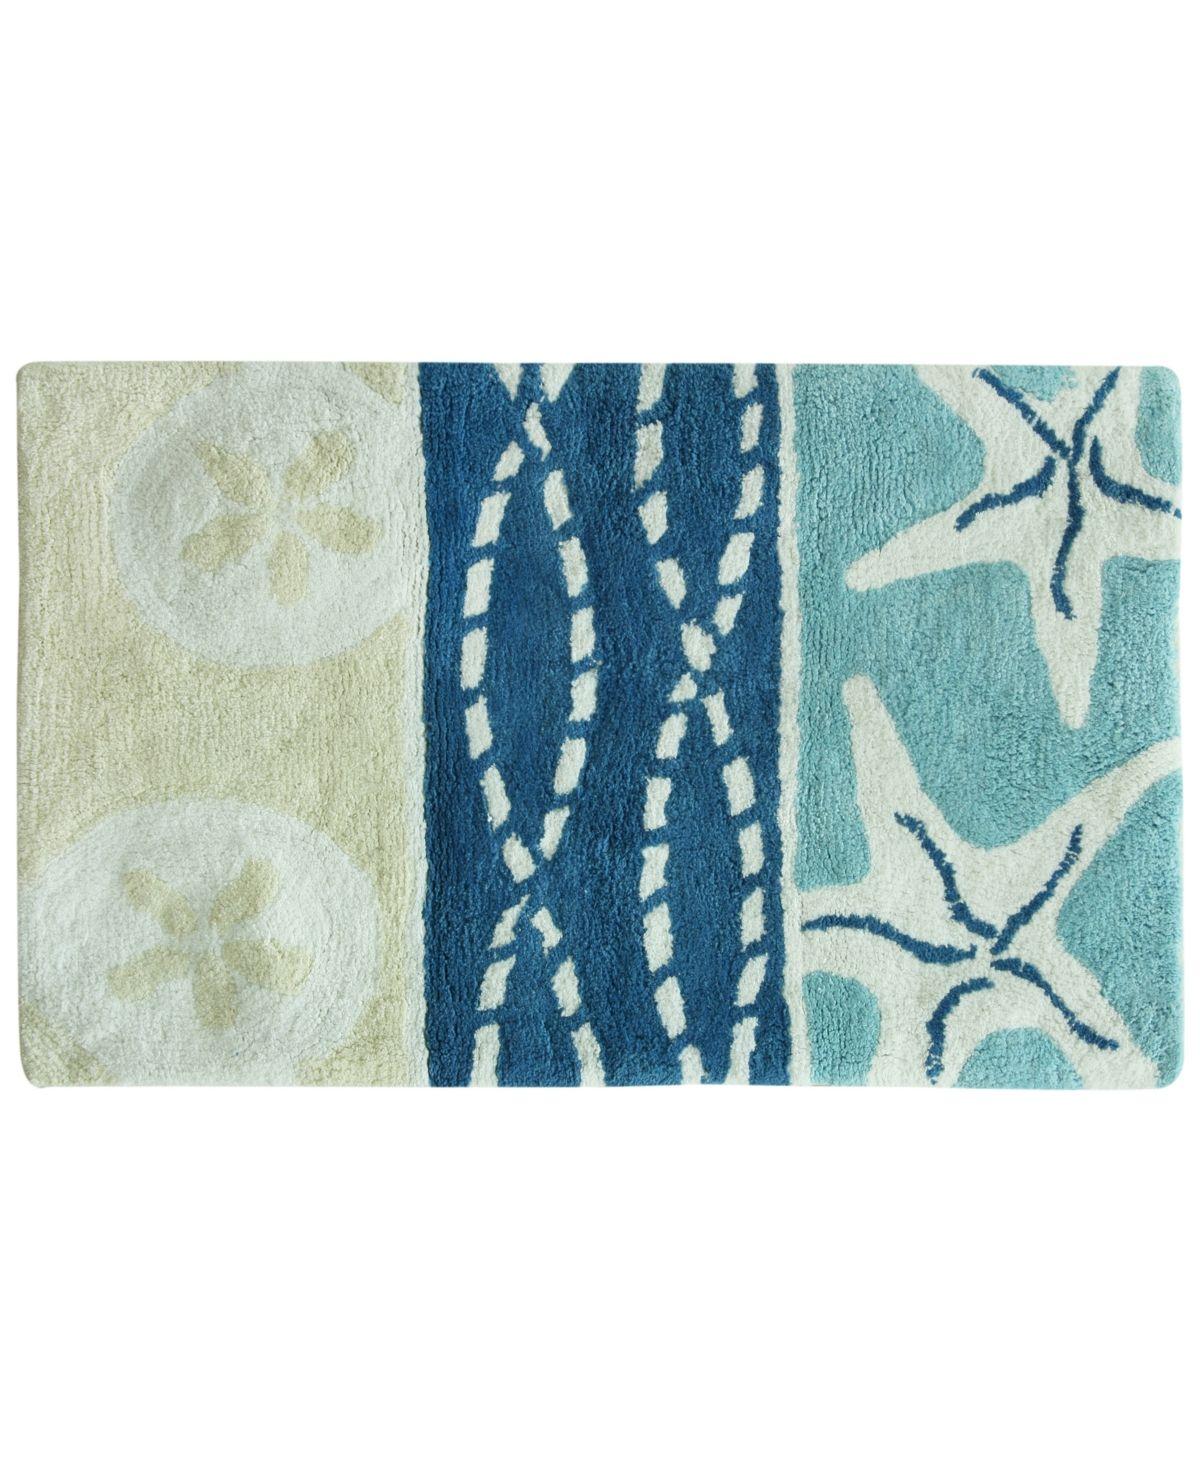 Bacova Coastal Patch Cotton 20 X 30 Bath Rug Multi Cotton